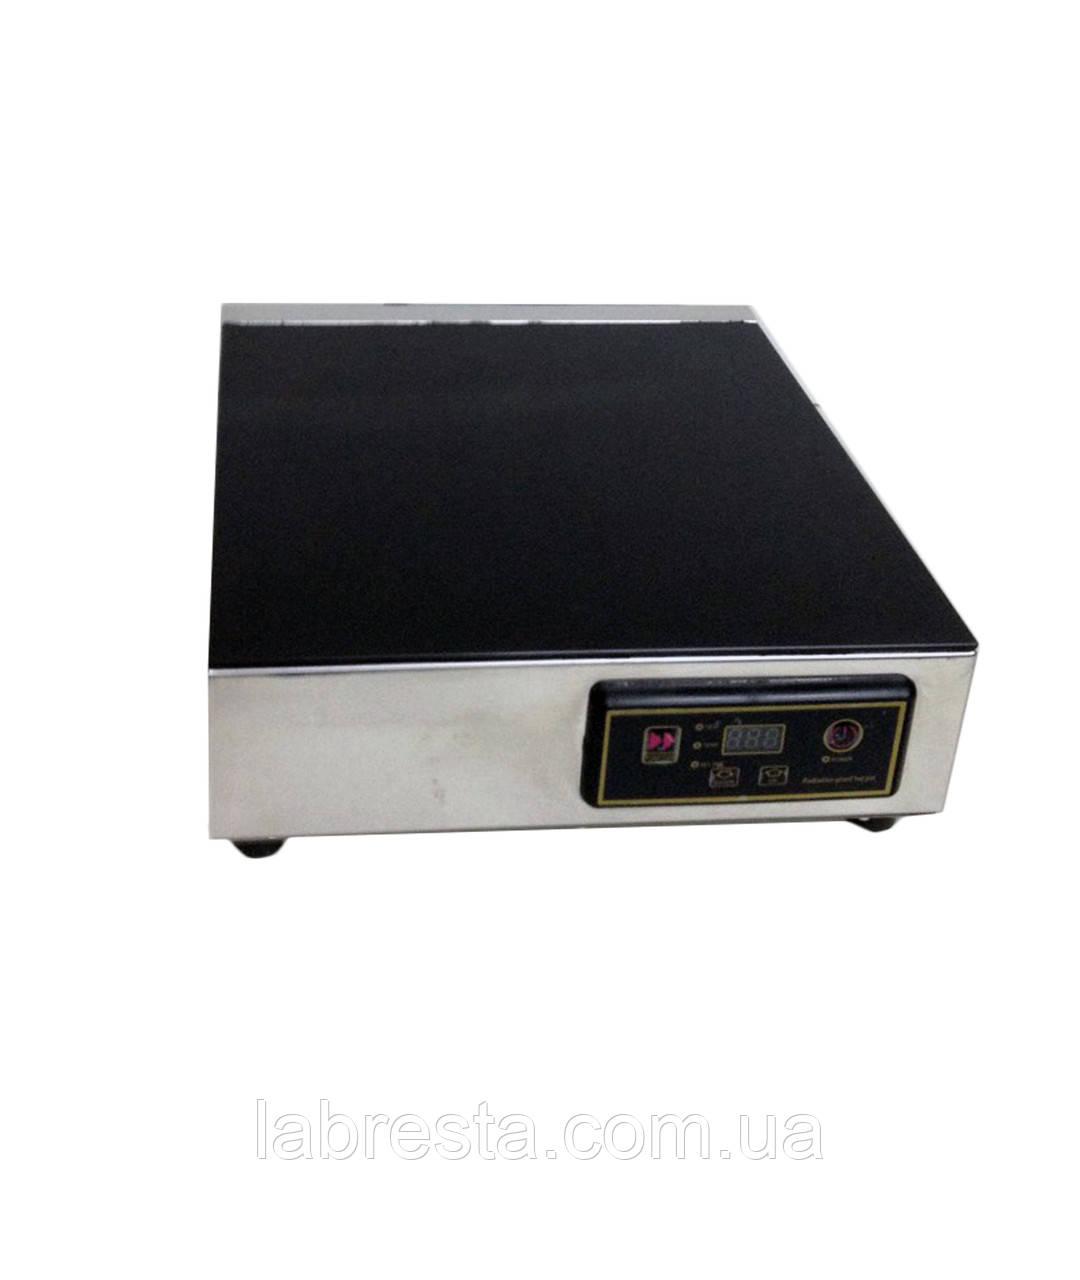 Плита индукционная Skvara Siе 1.2 (1х2 кВт)